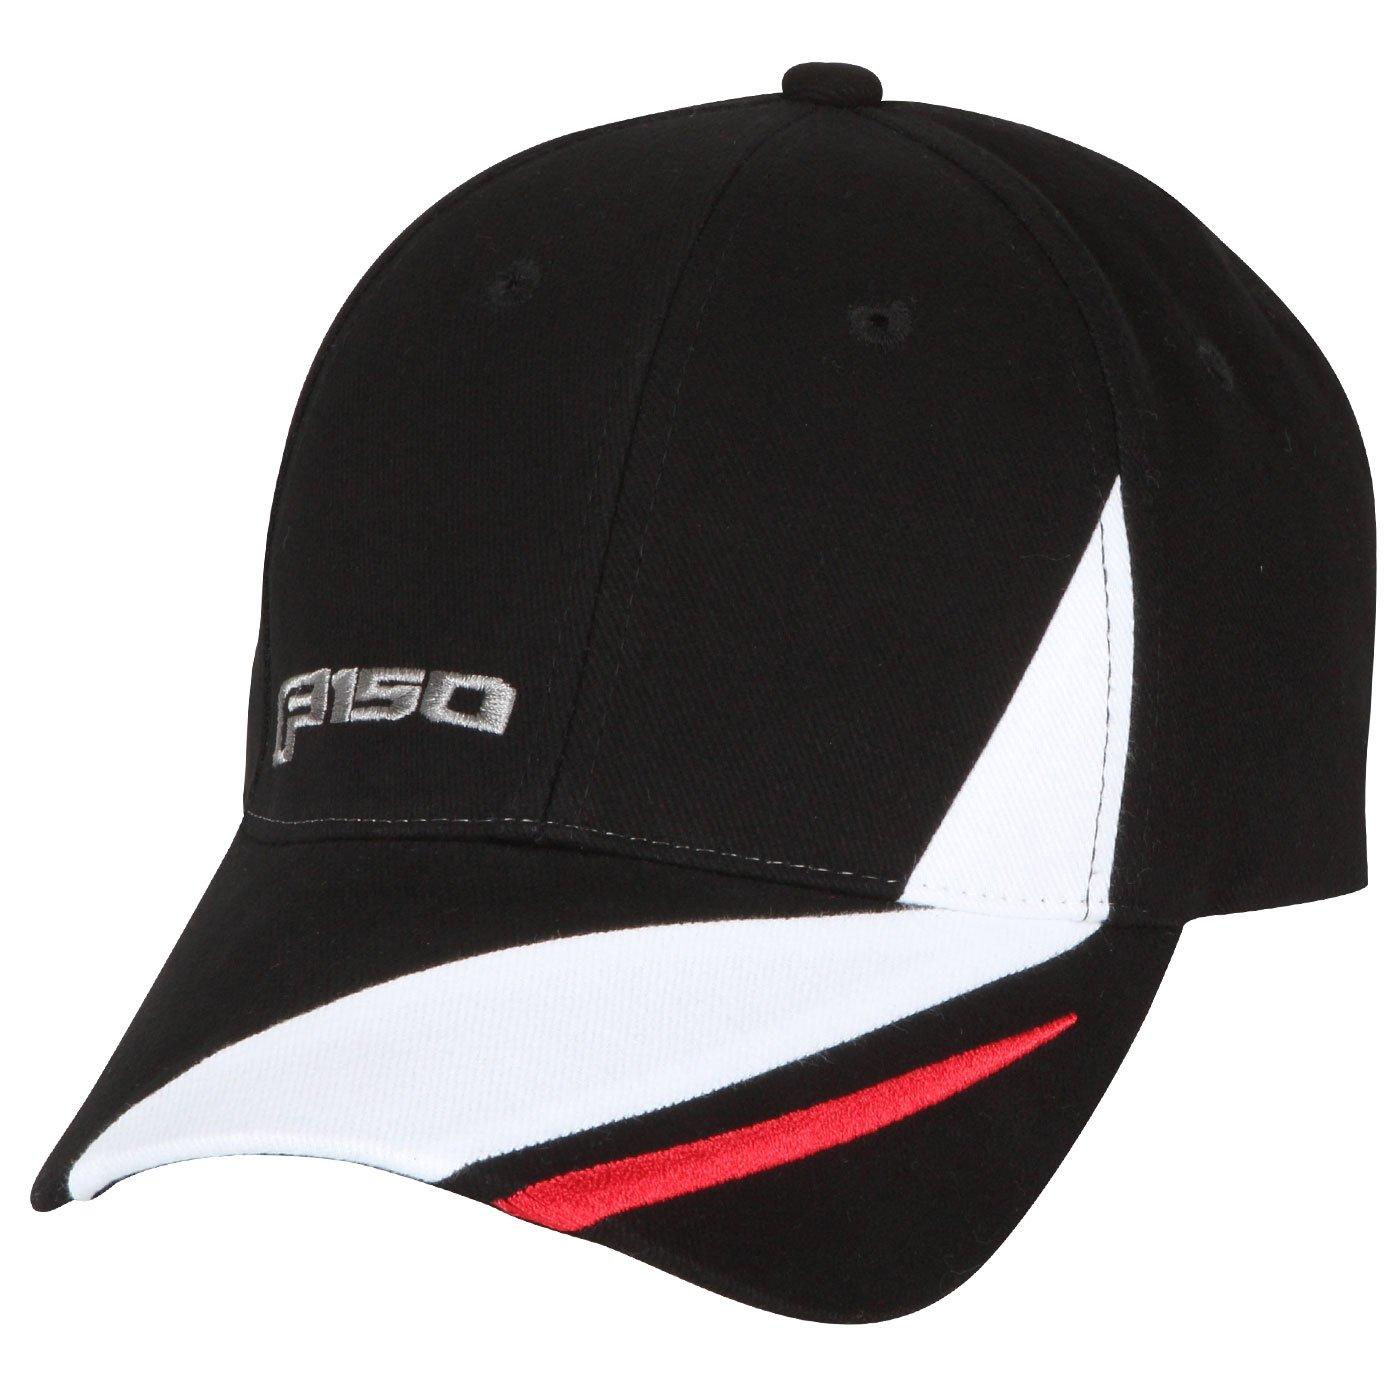 Apparel Ford F150 Black Red White Cotton Hat Interior Accessories